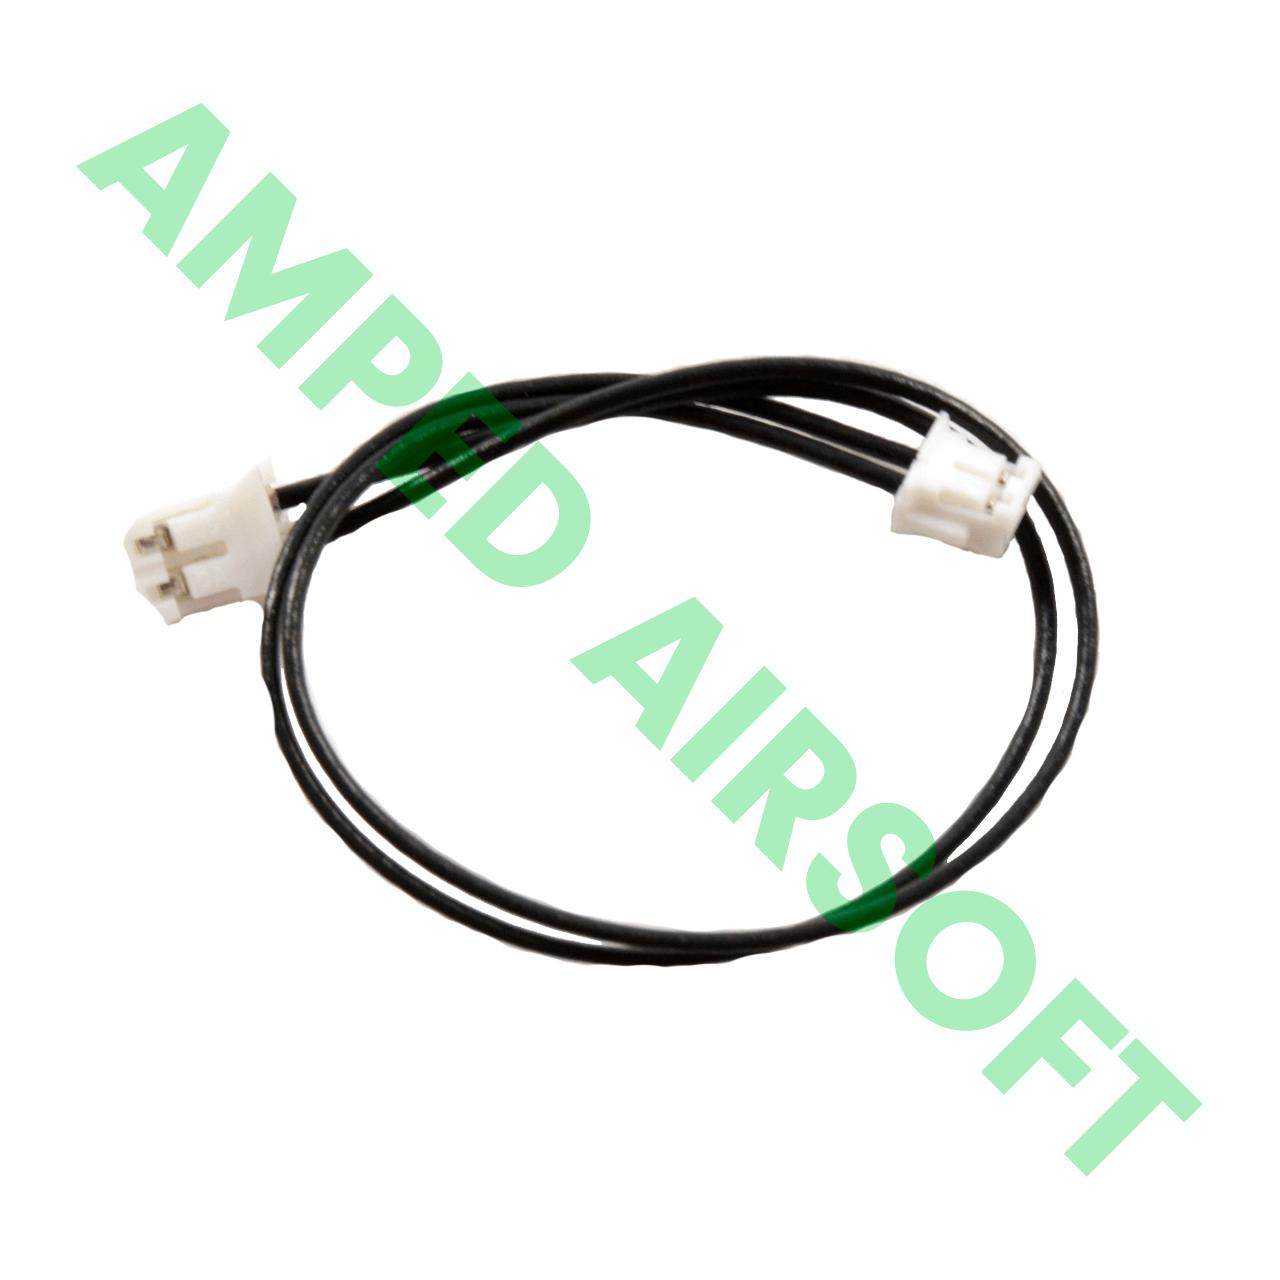 polarstar bullet valve solenoid wiring harness for 214 309 solenoids jack  [ 1280 x 1280 Pixel ]